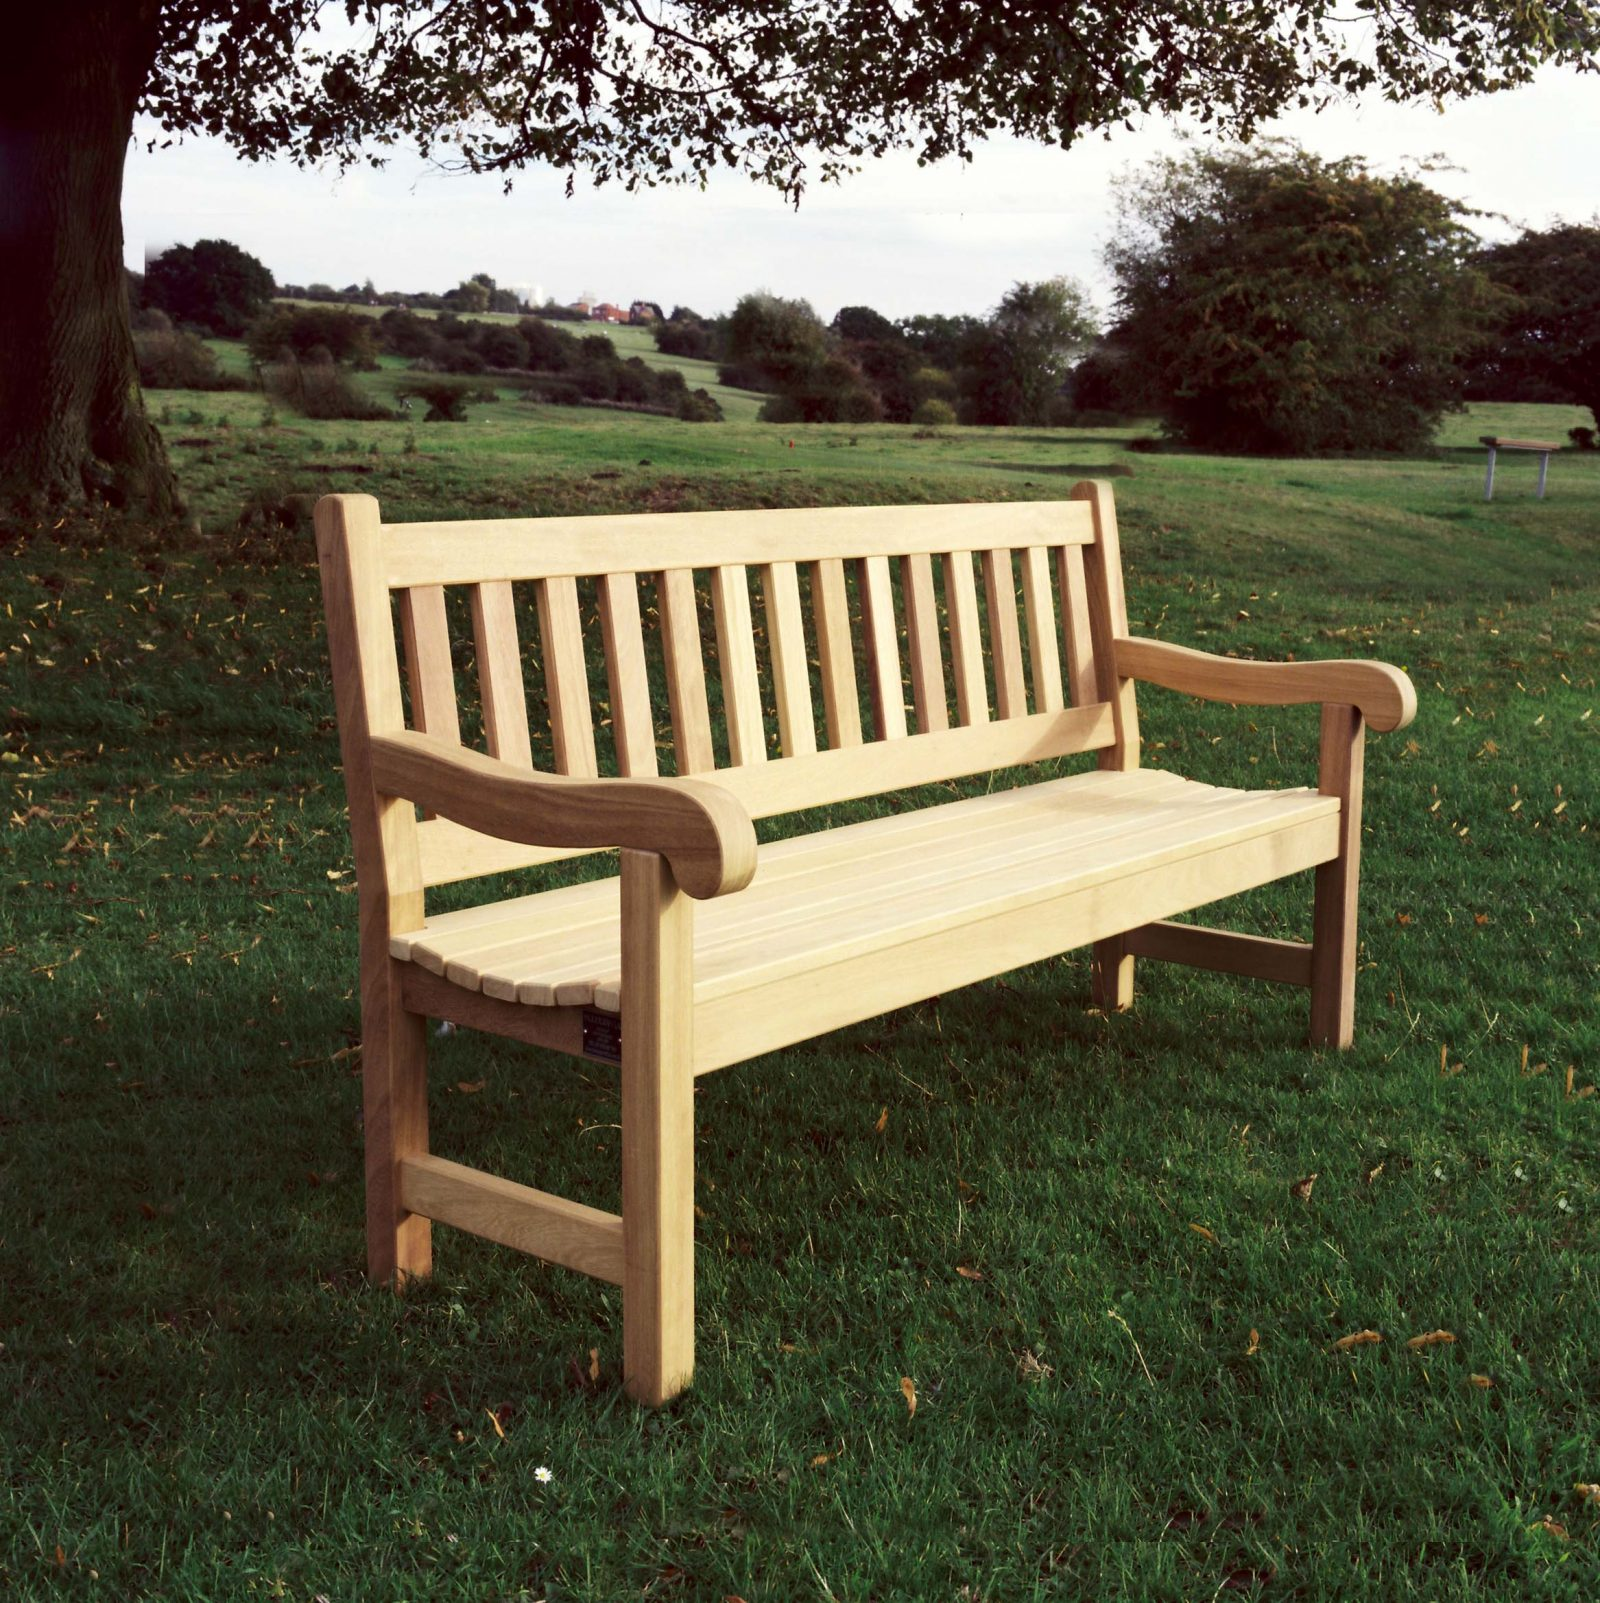 Mendip 4ft Wooden Memorial Bench and Memorial Seat made in ...